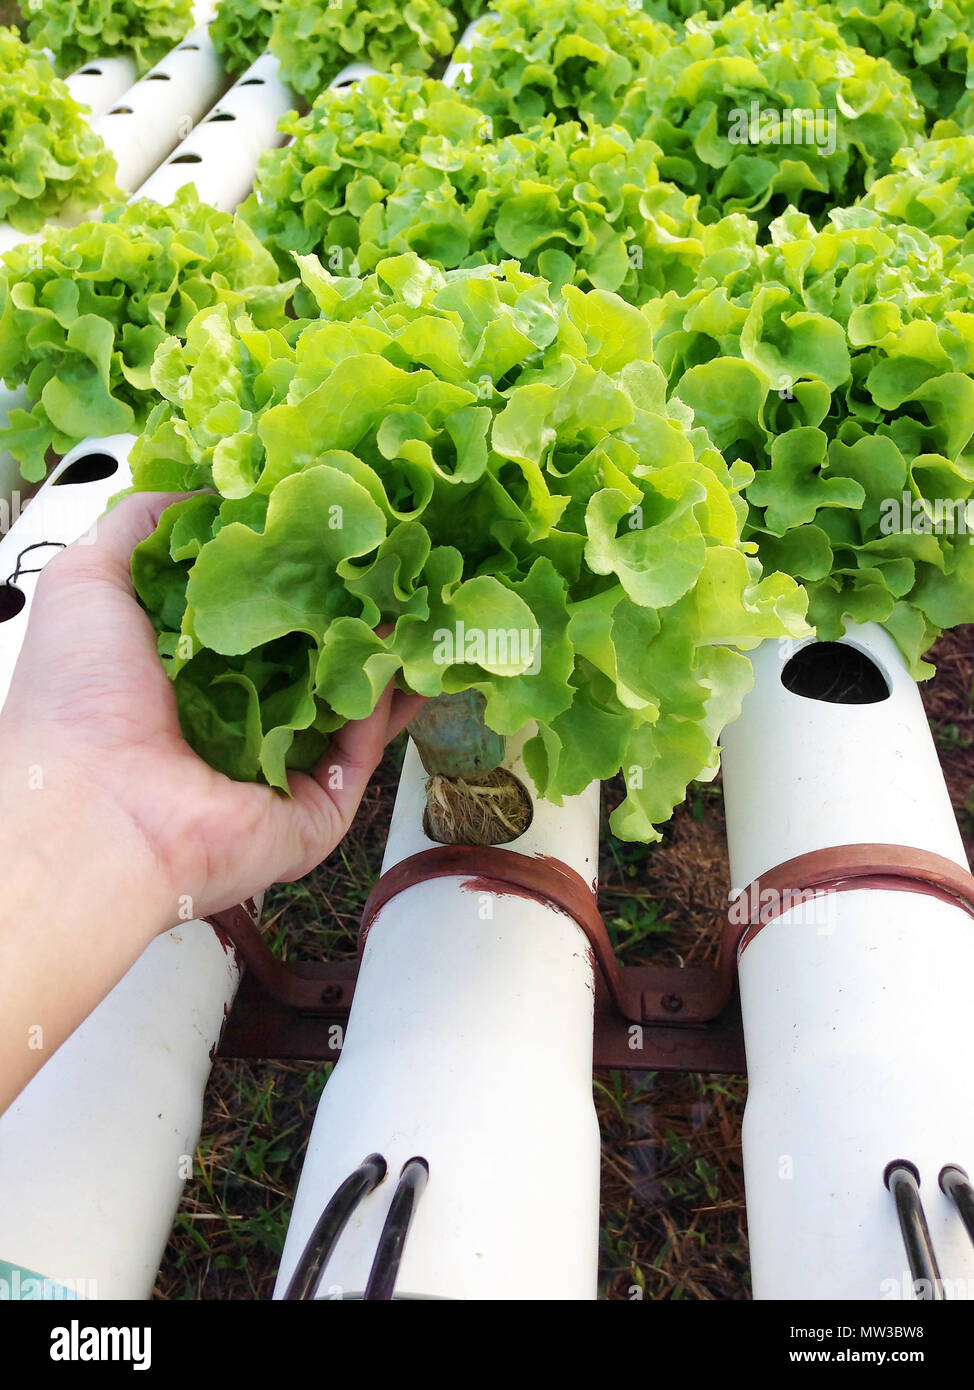 Harvest organic hydroponic vegetable cultivation farm Stock Photo